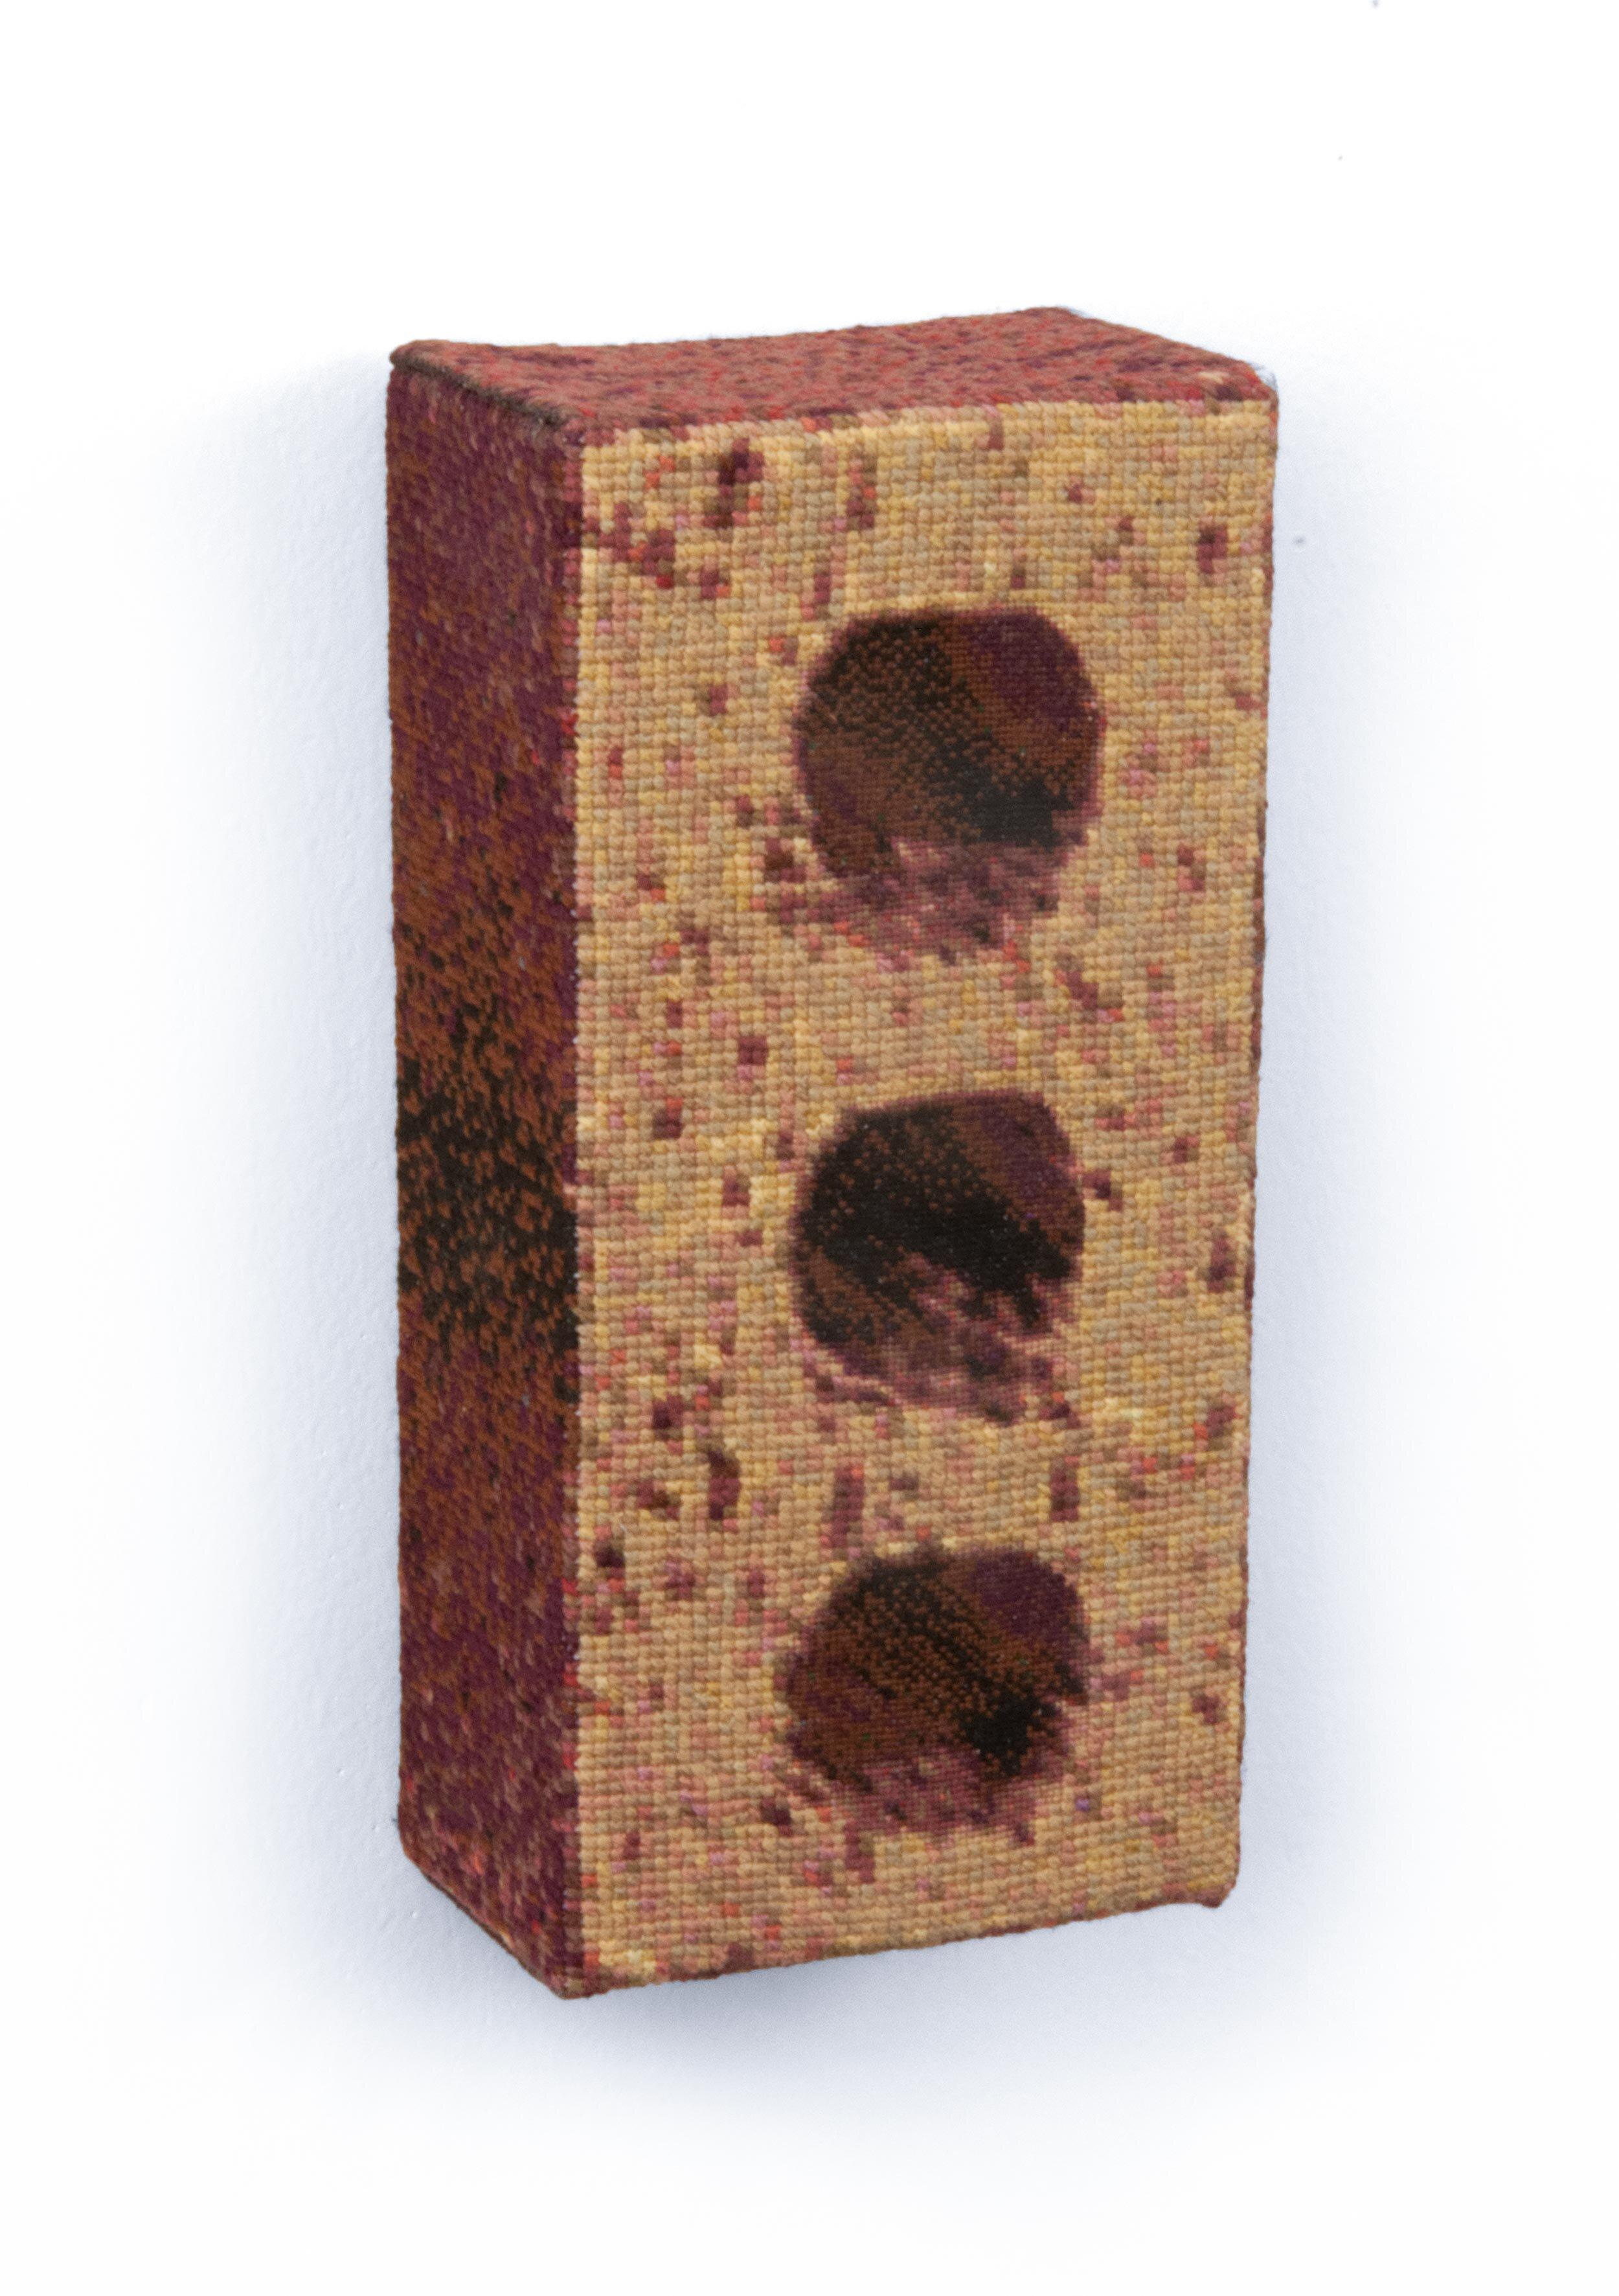 Brick 158